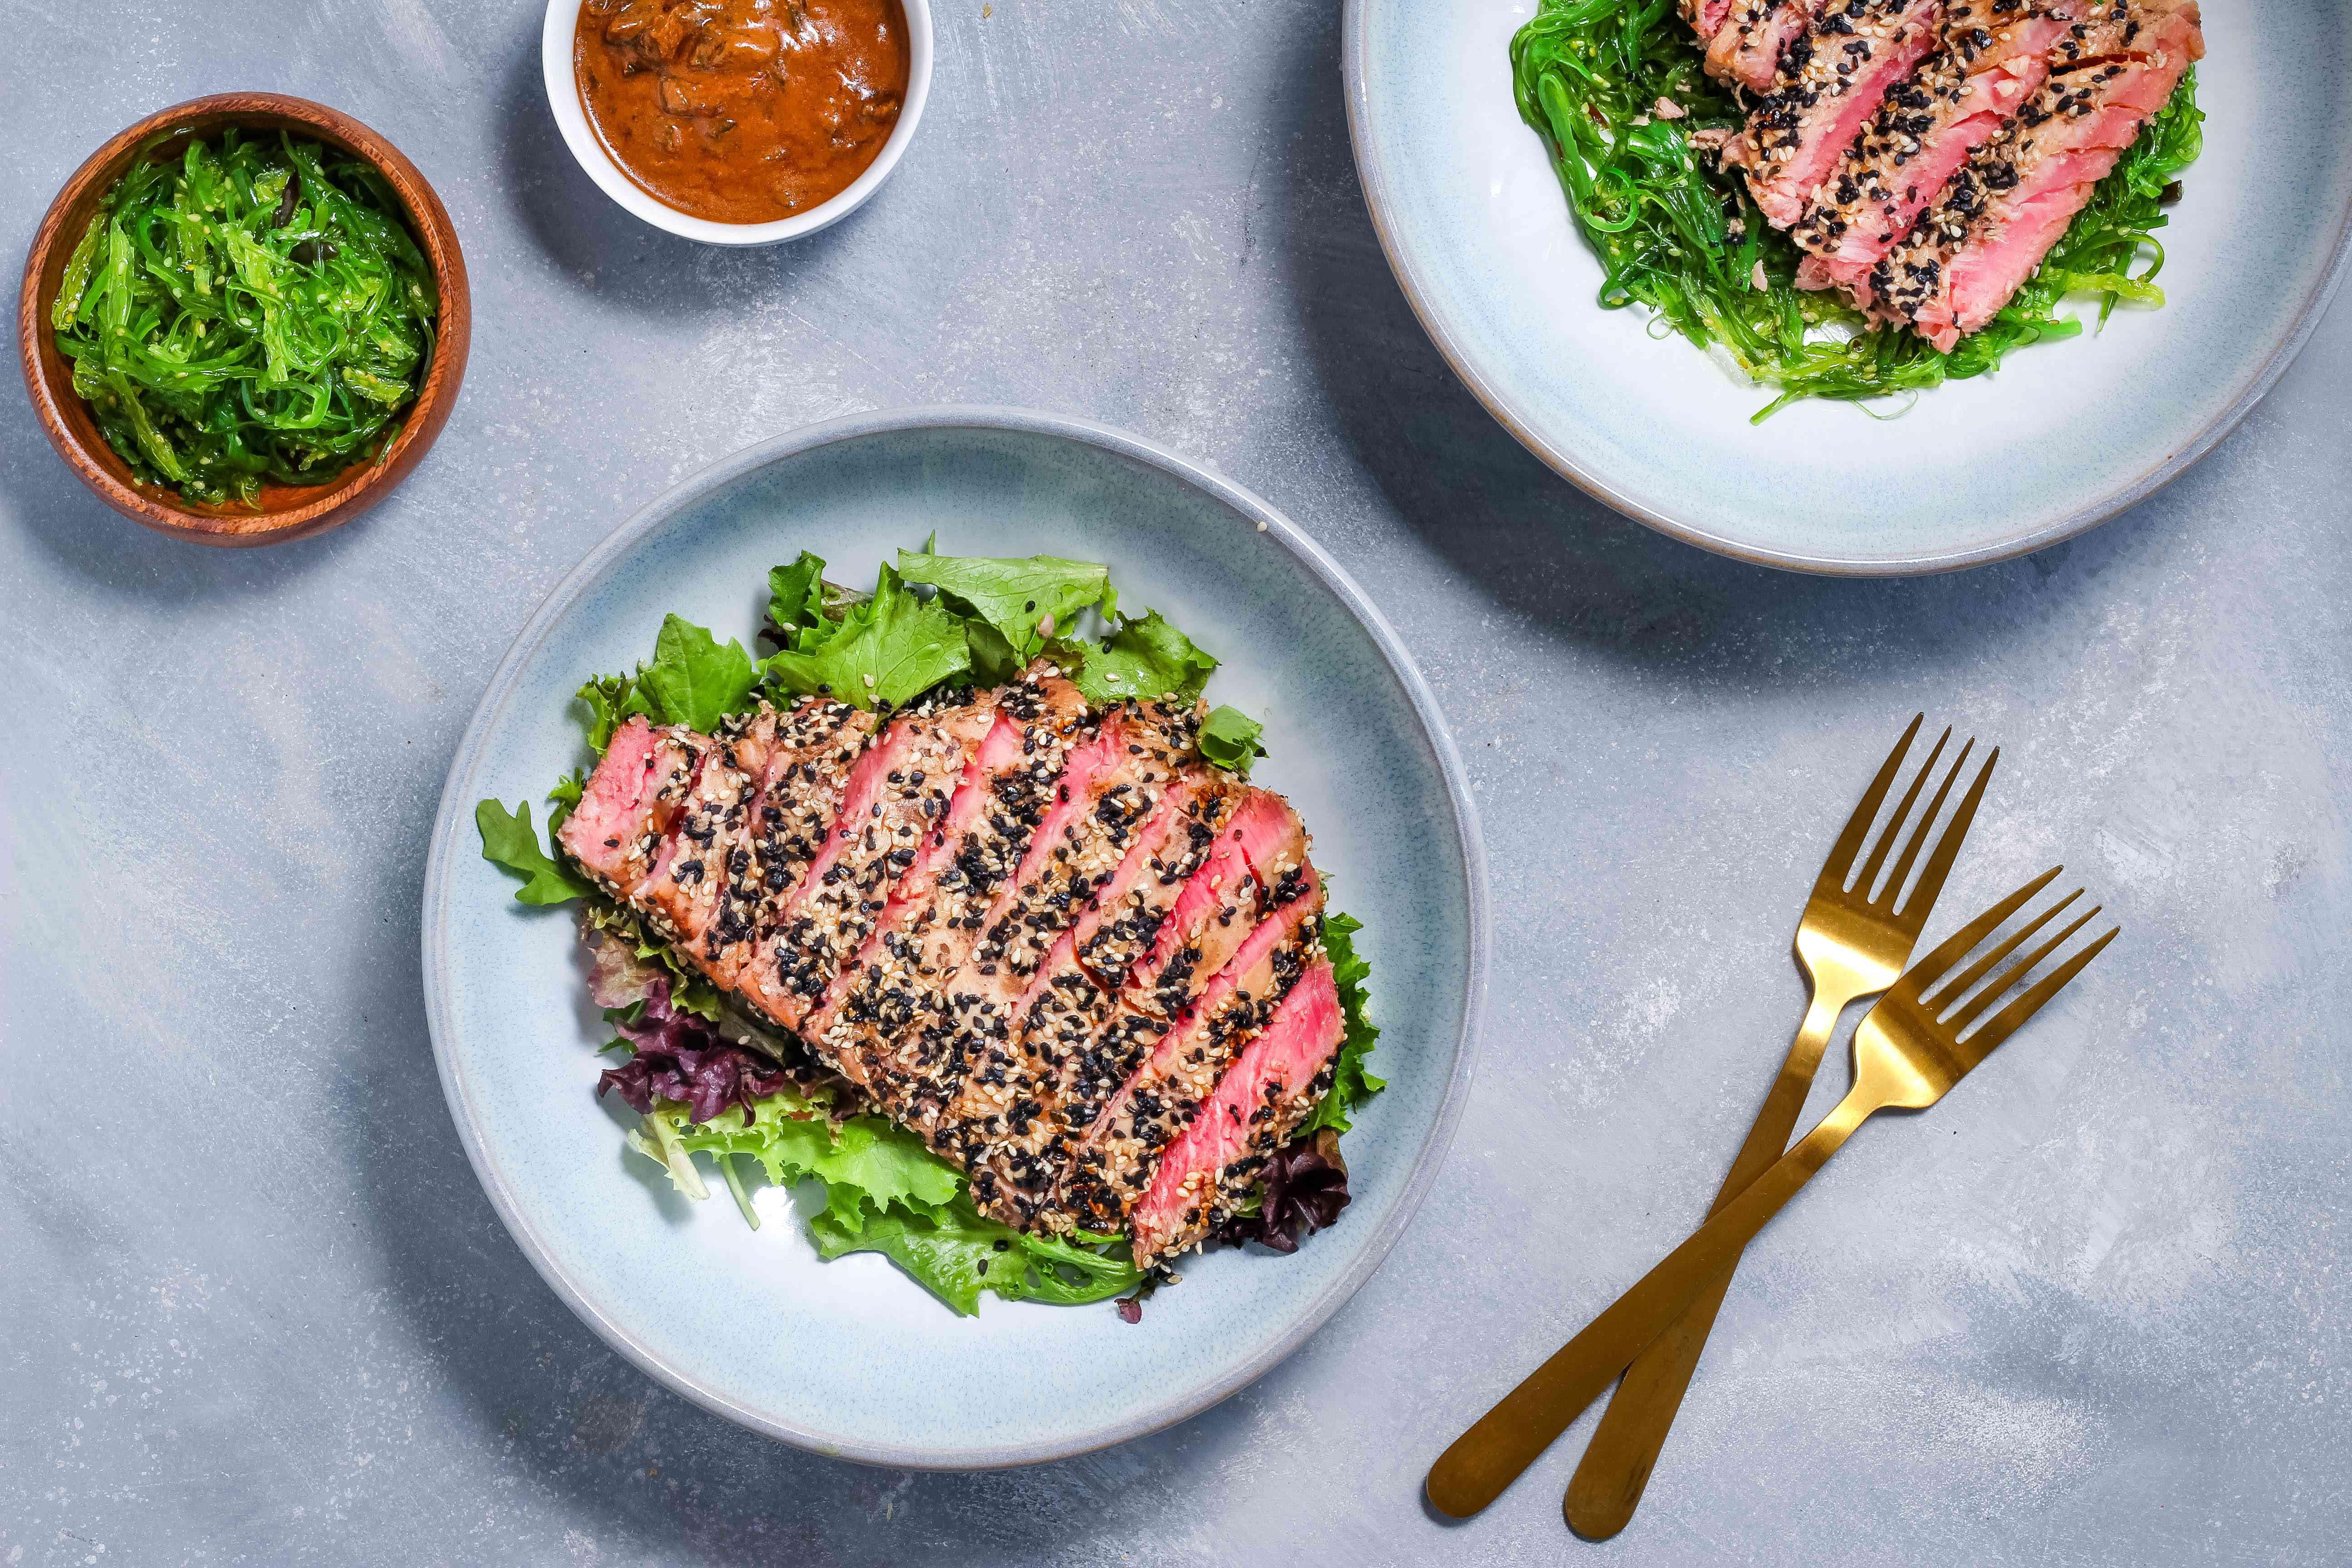 Grilled tuna steaks with Asian sesame crust recipe